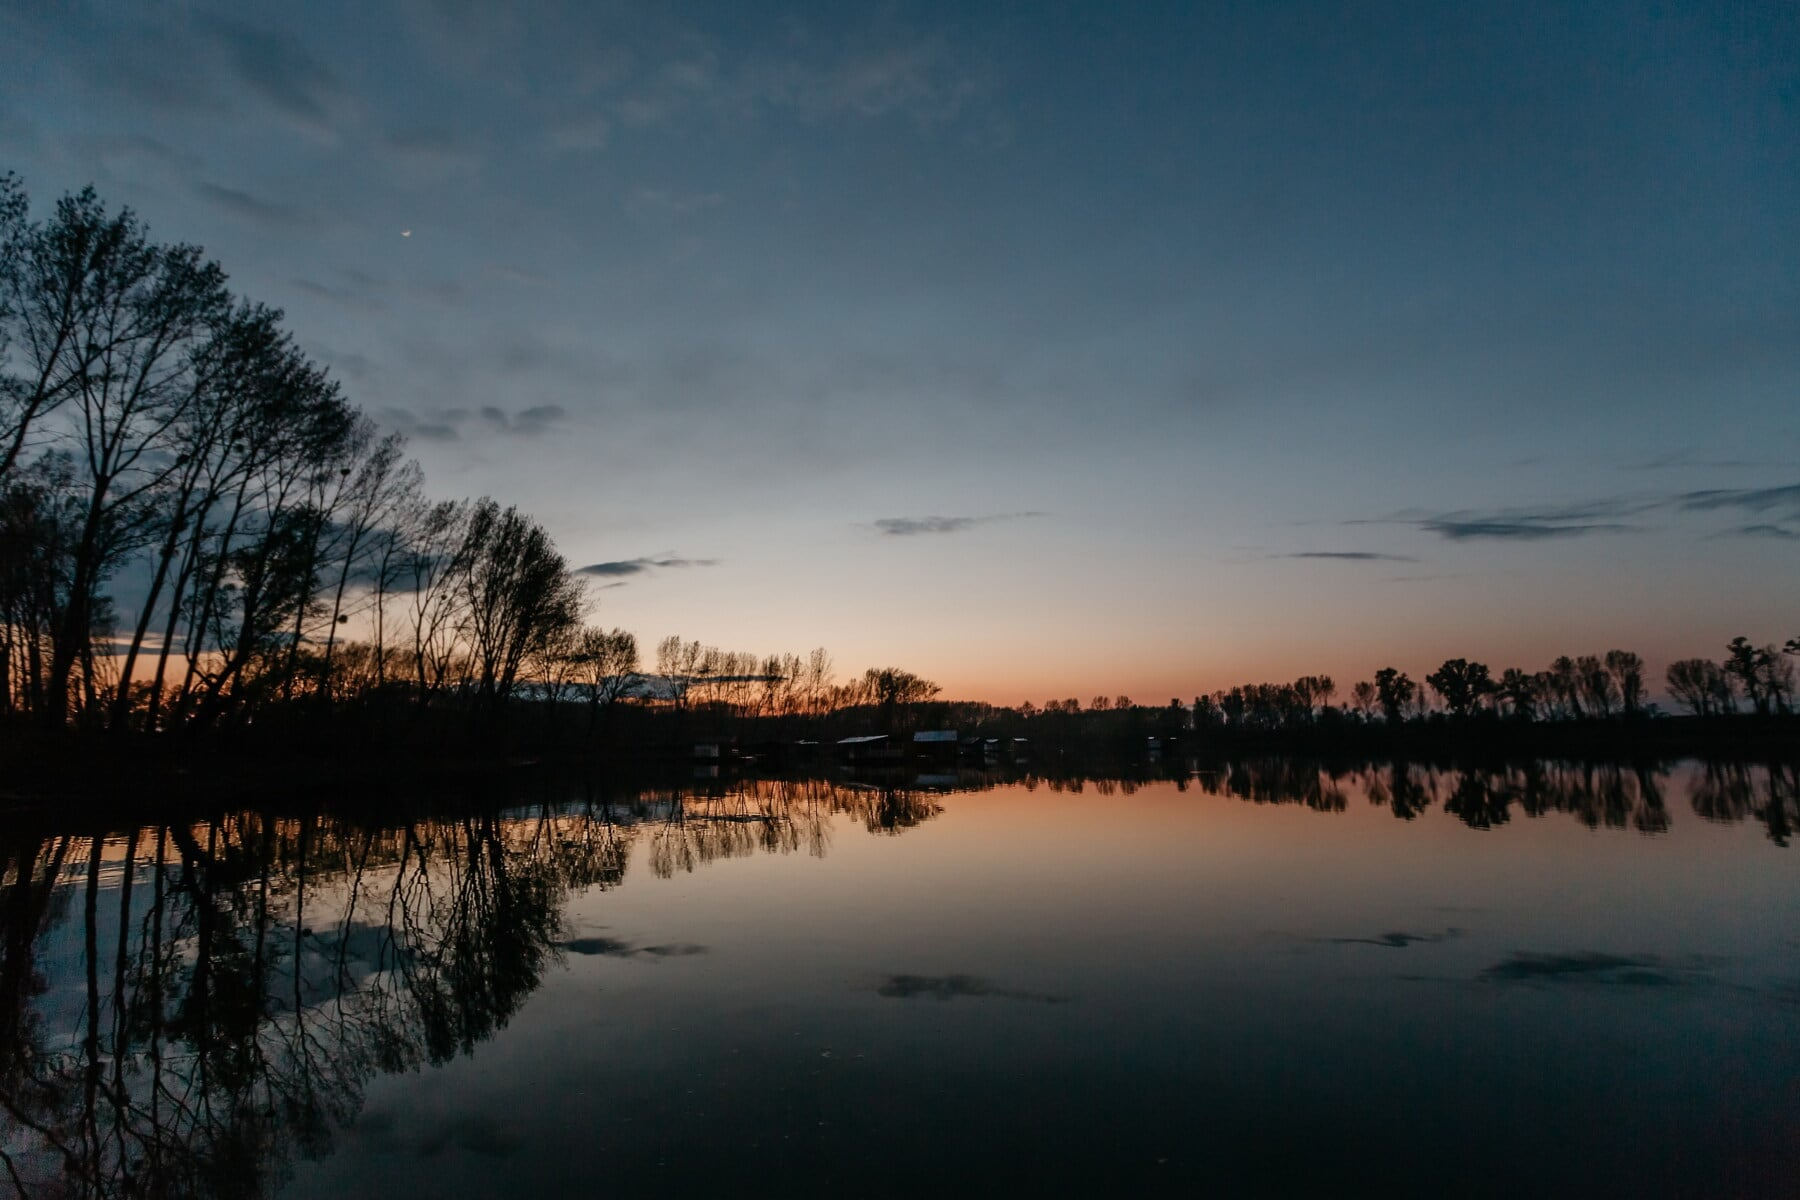 atmosphere, landscape, nature, calm, sunrays, lakeside, dawn, lake, water, sunset